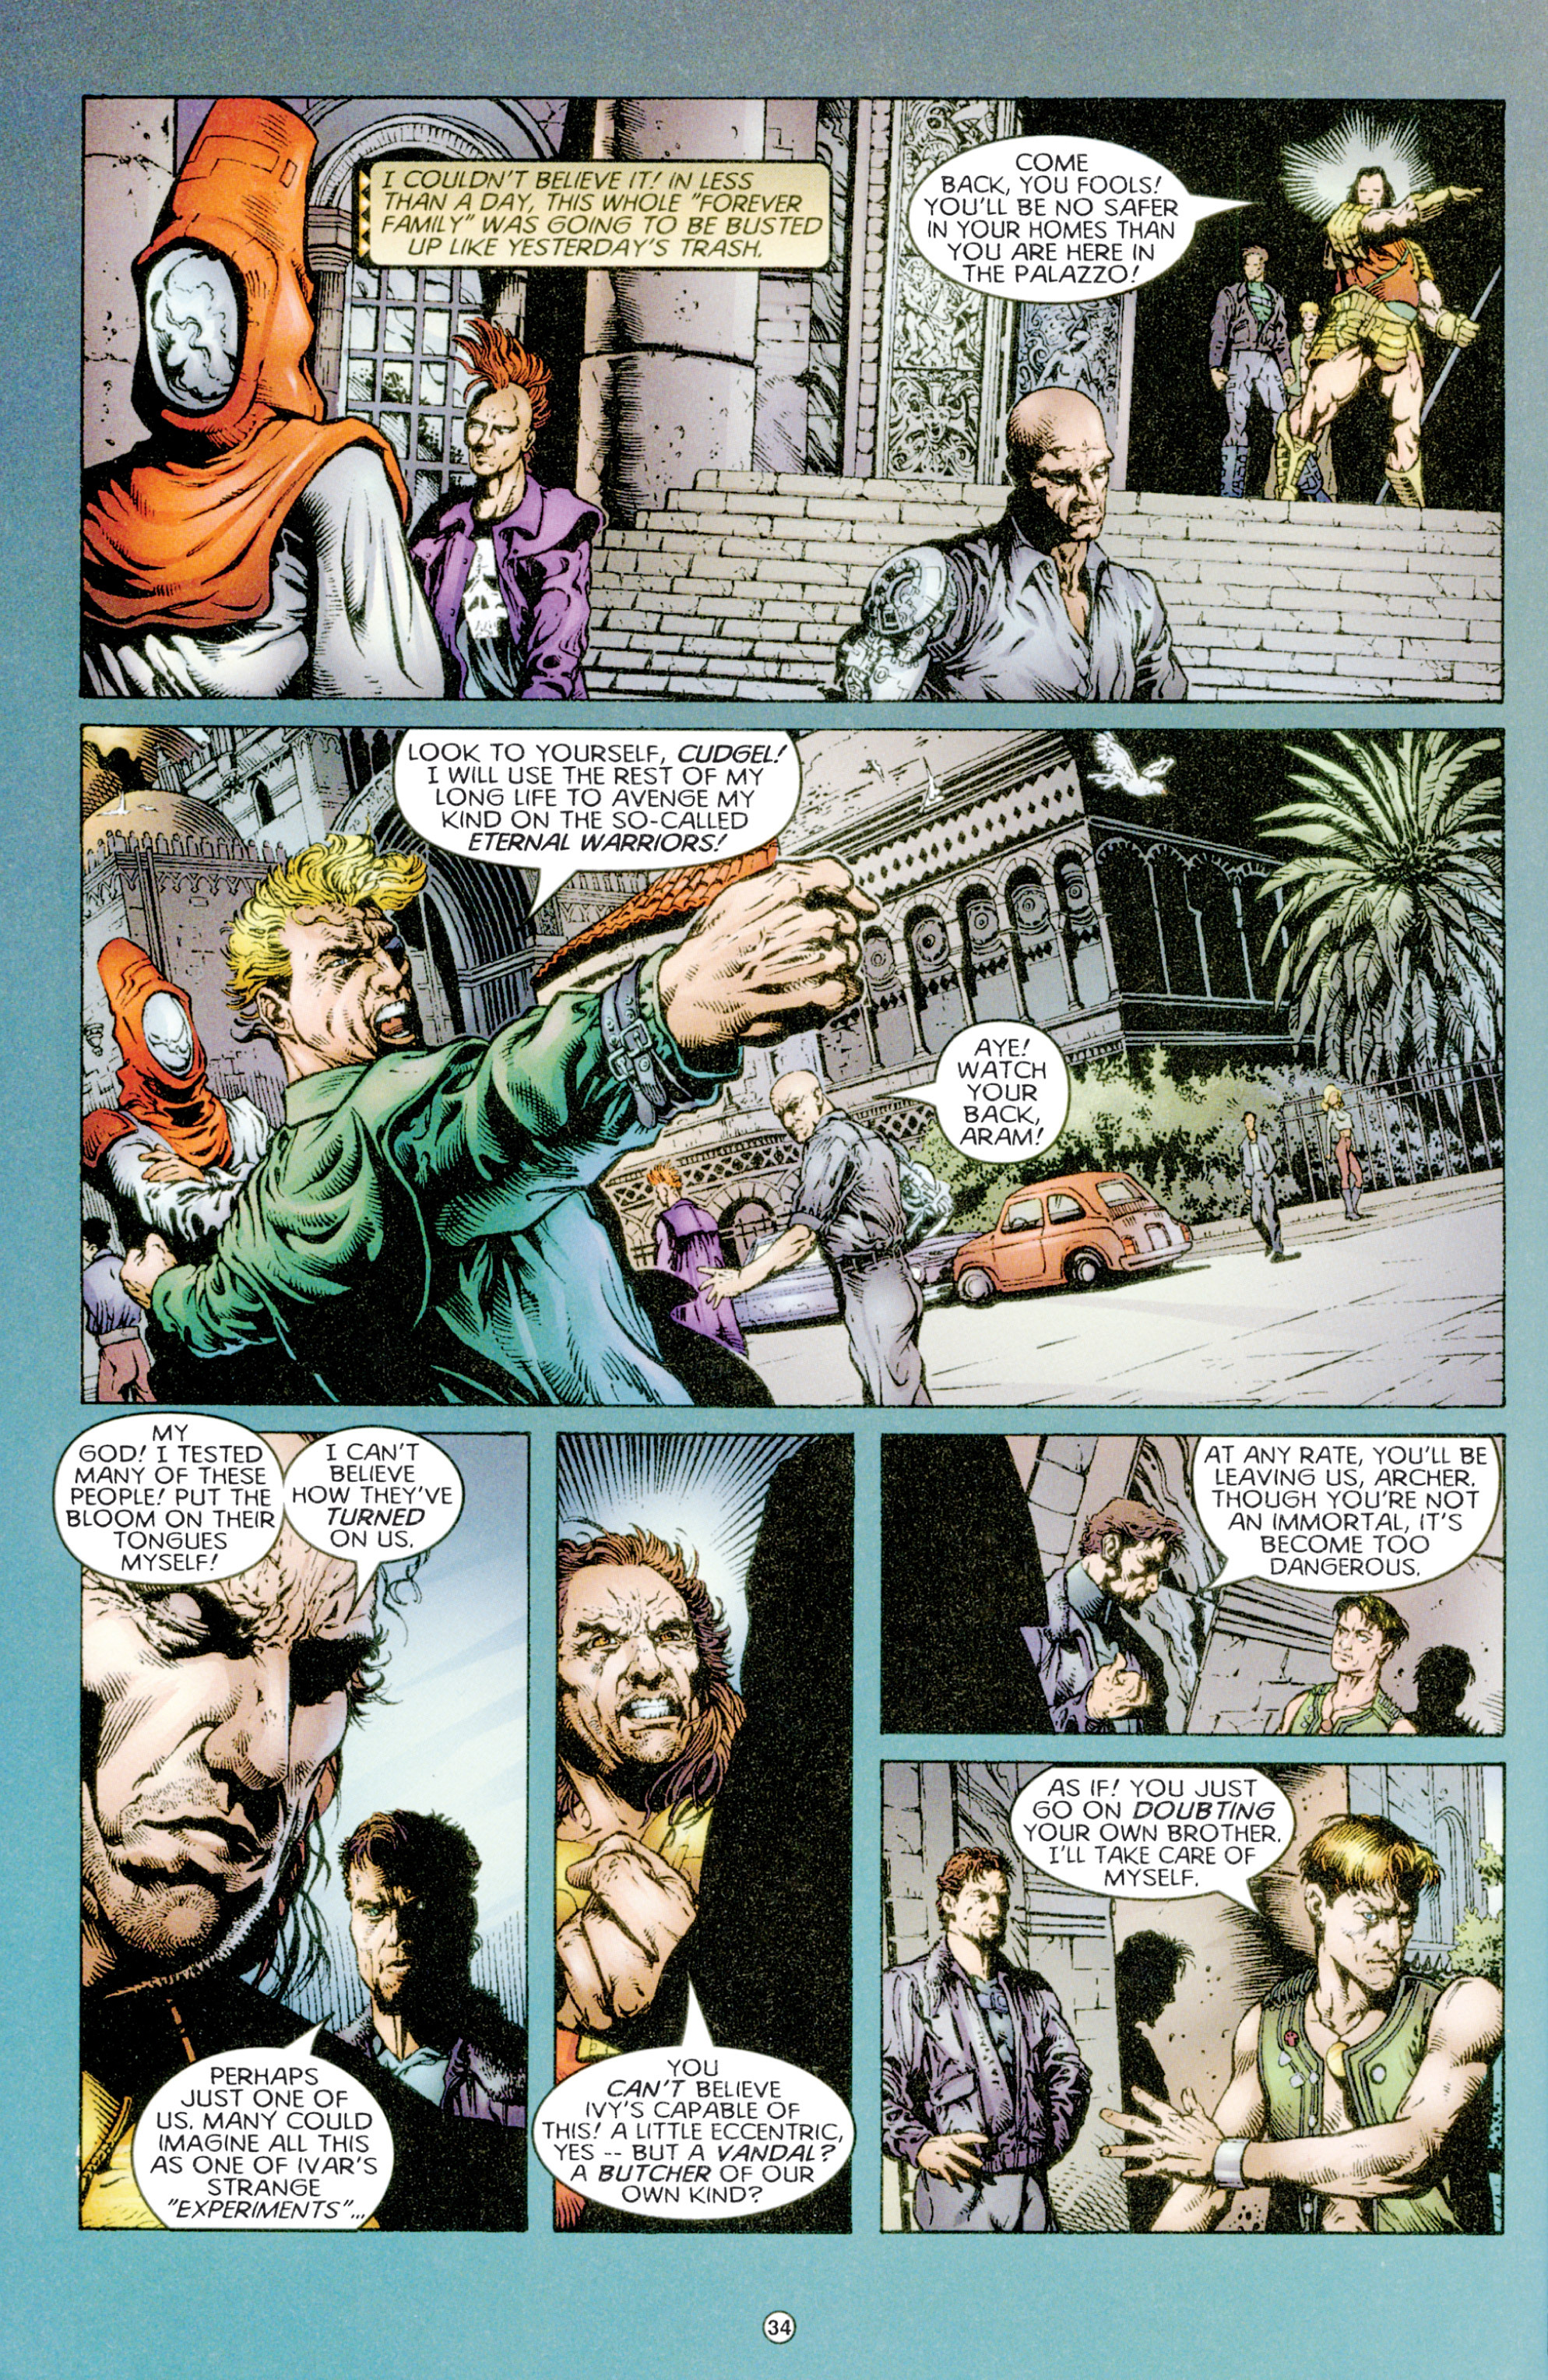 Read online Eternal Warriors comic -  Issue # Issue Time & Treachery - 33